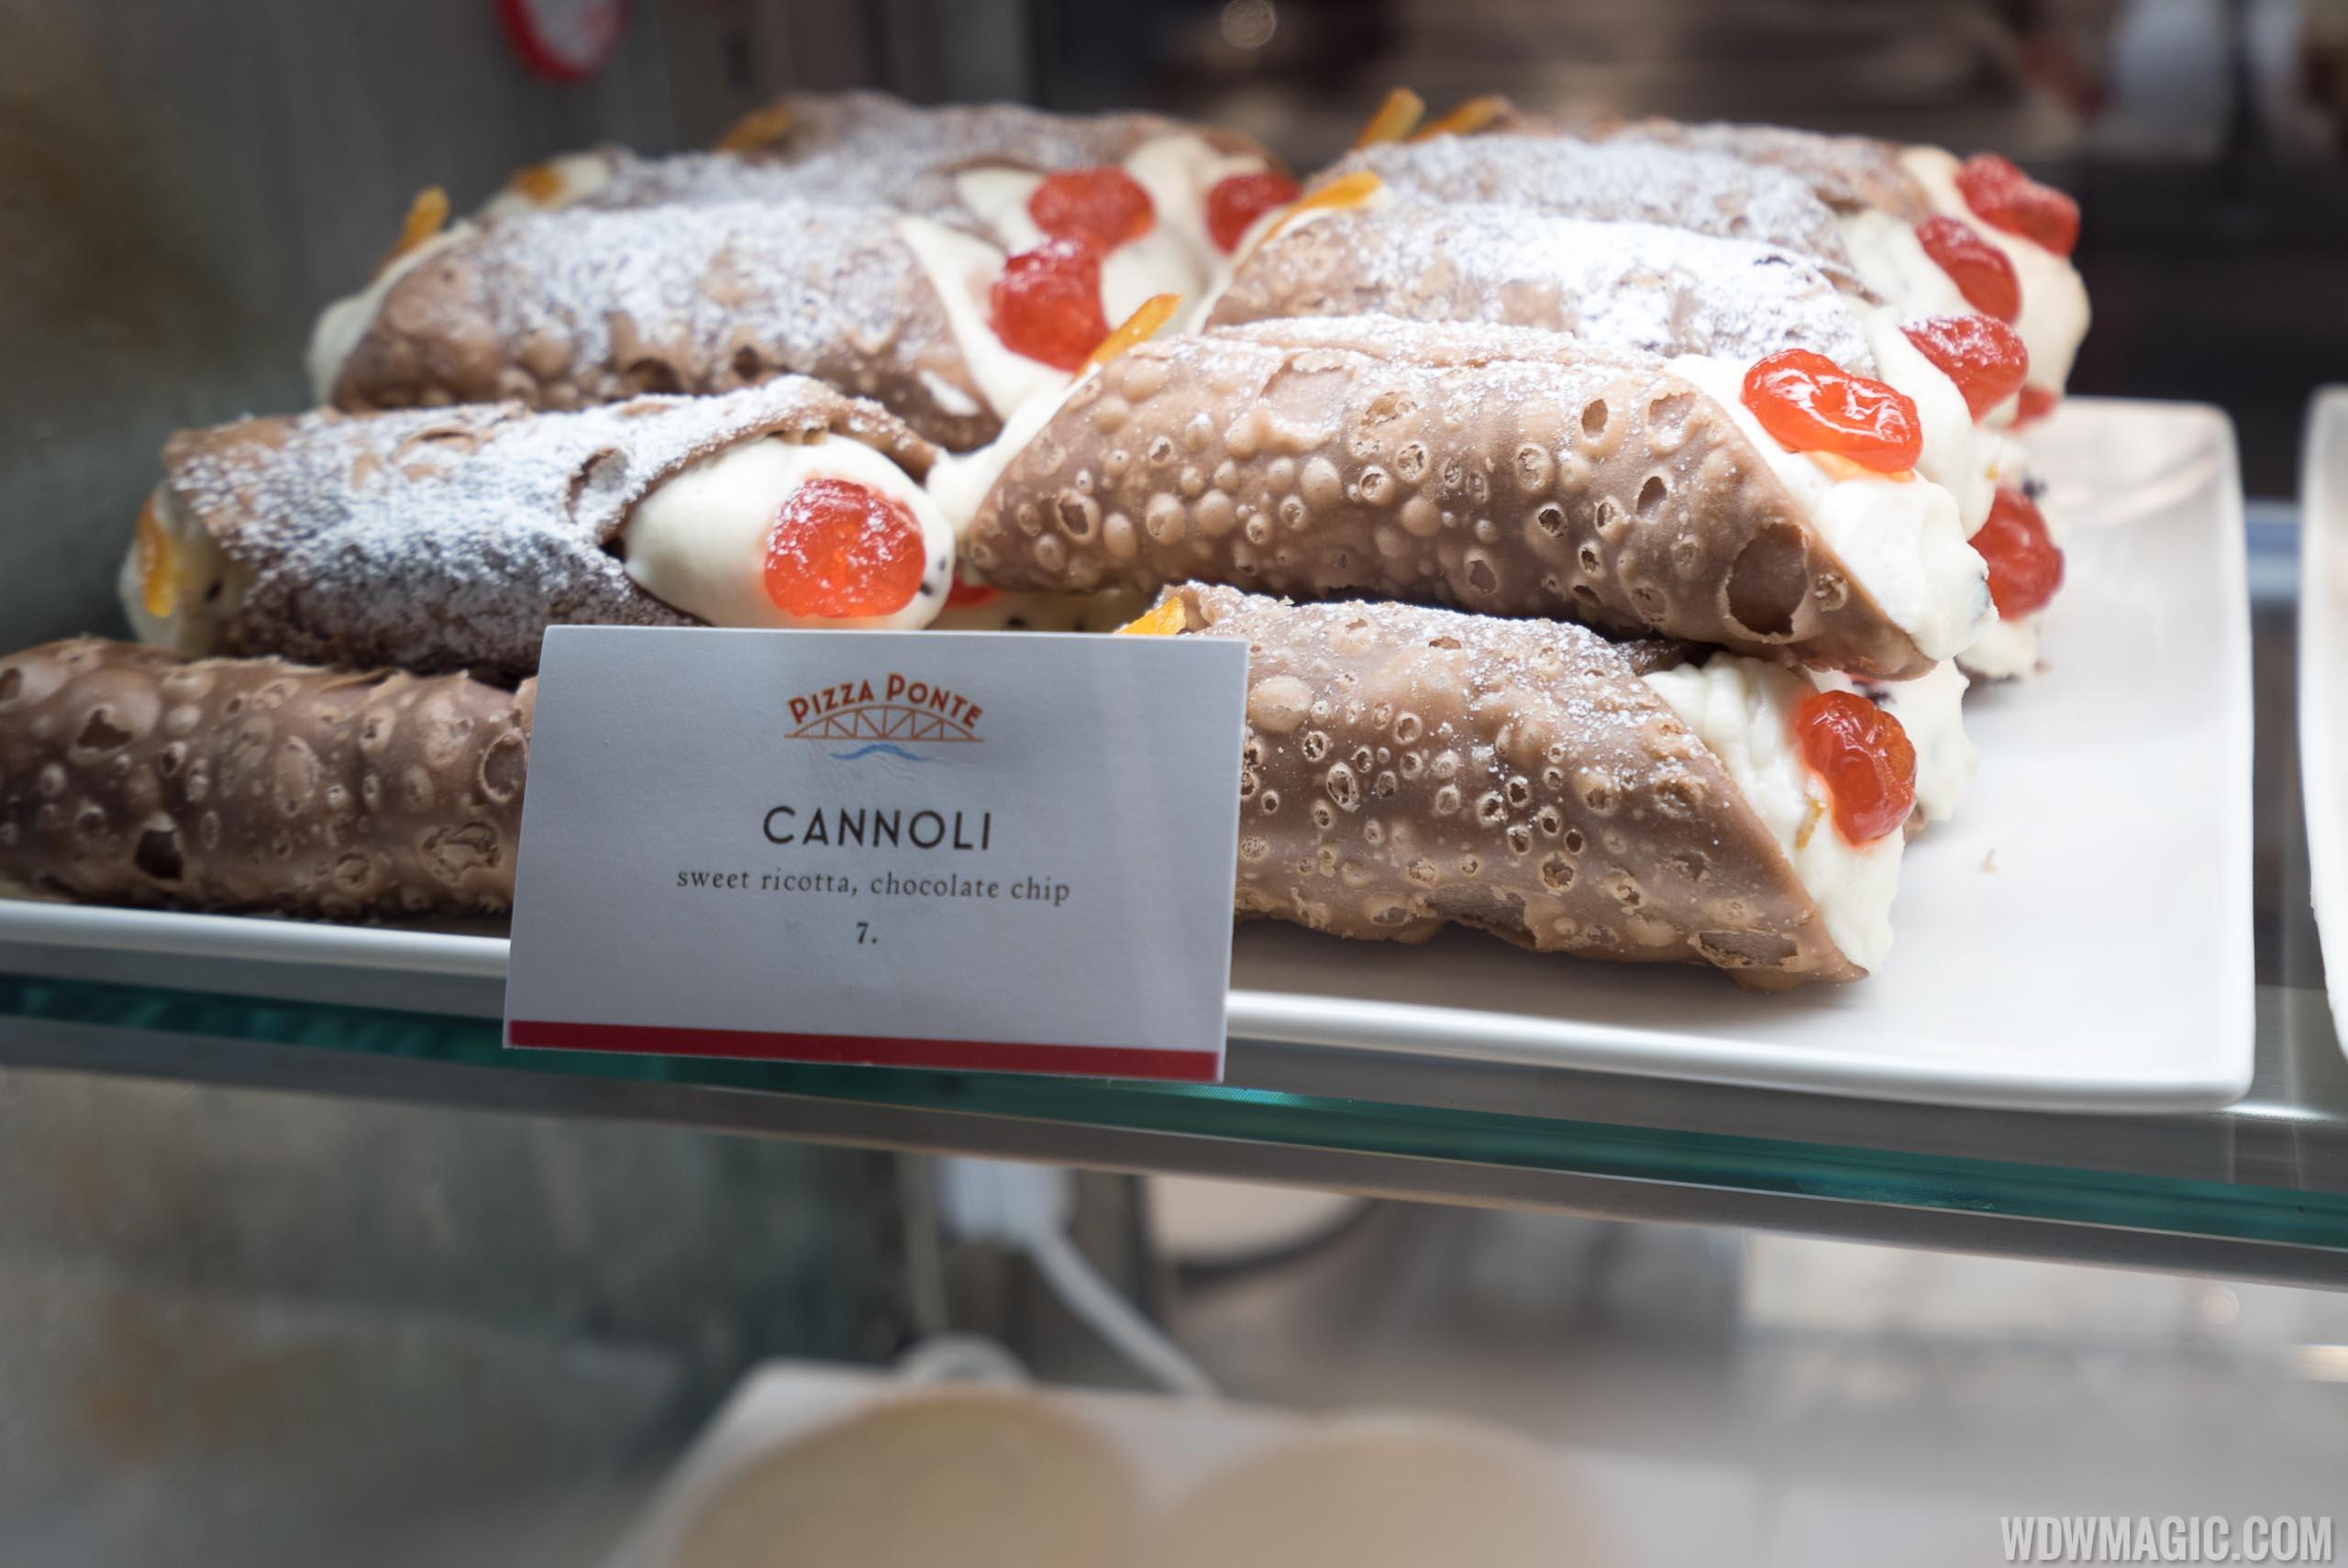 Pizza Ponte - Cannoli